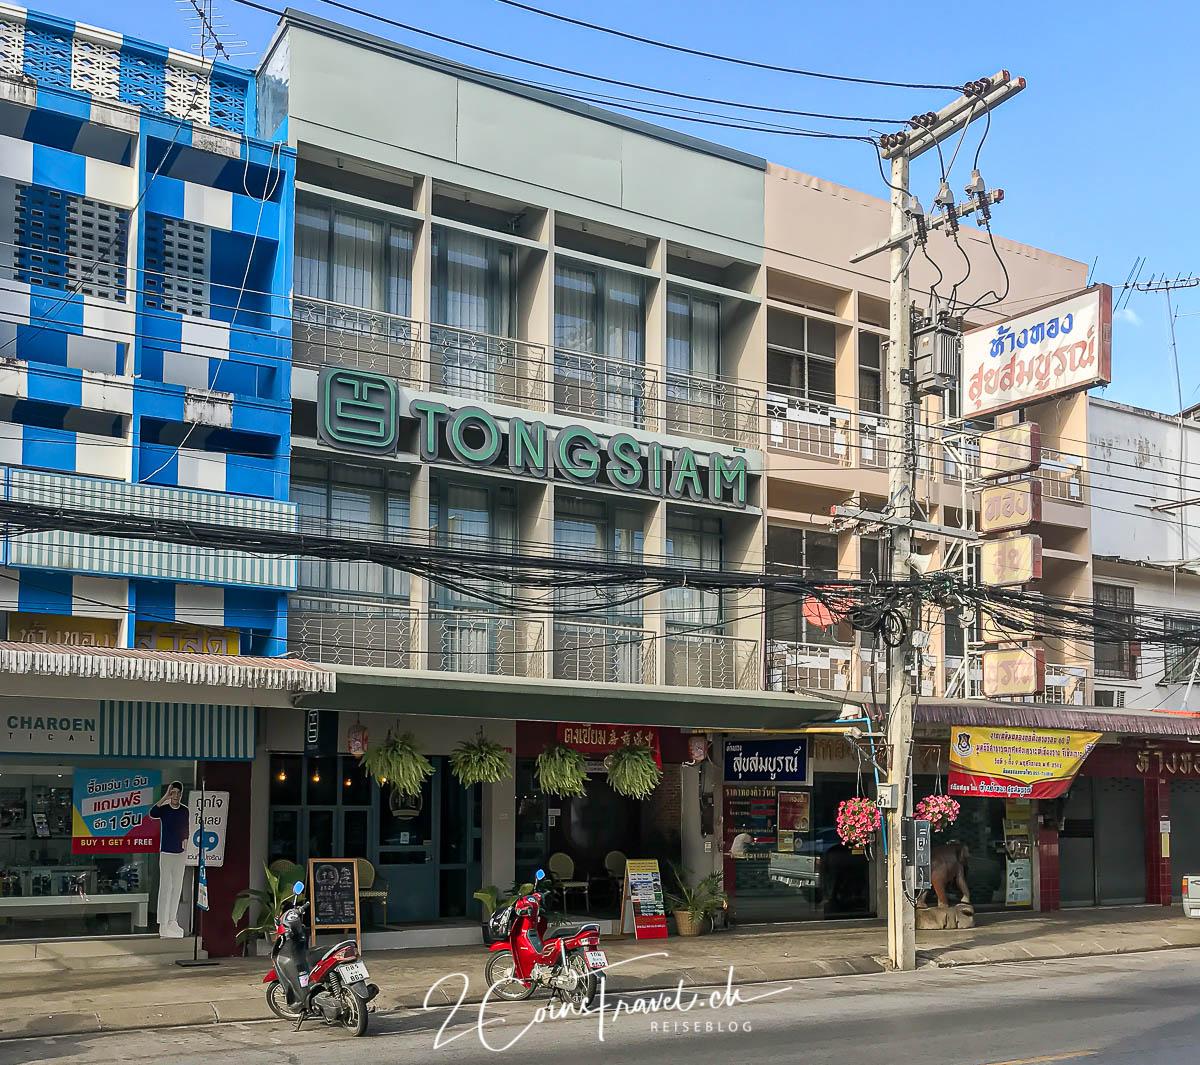 Tong Siam Chiang Rai